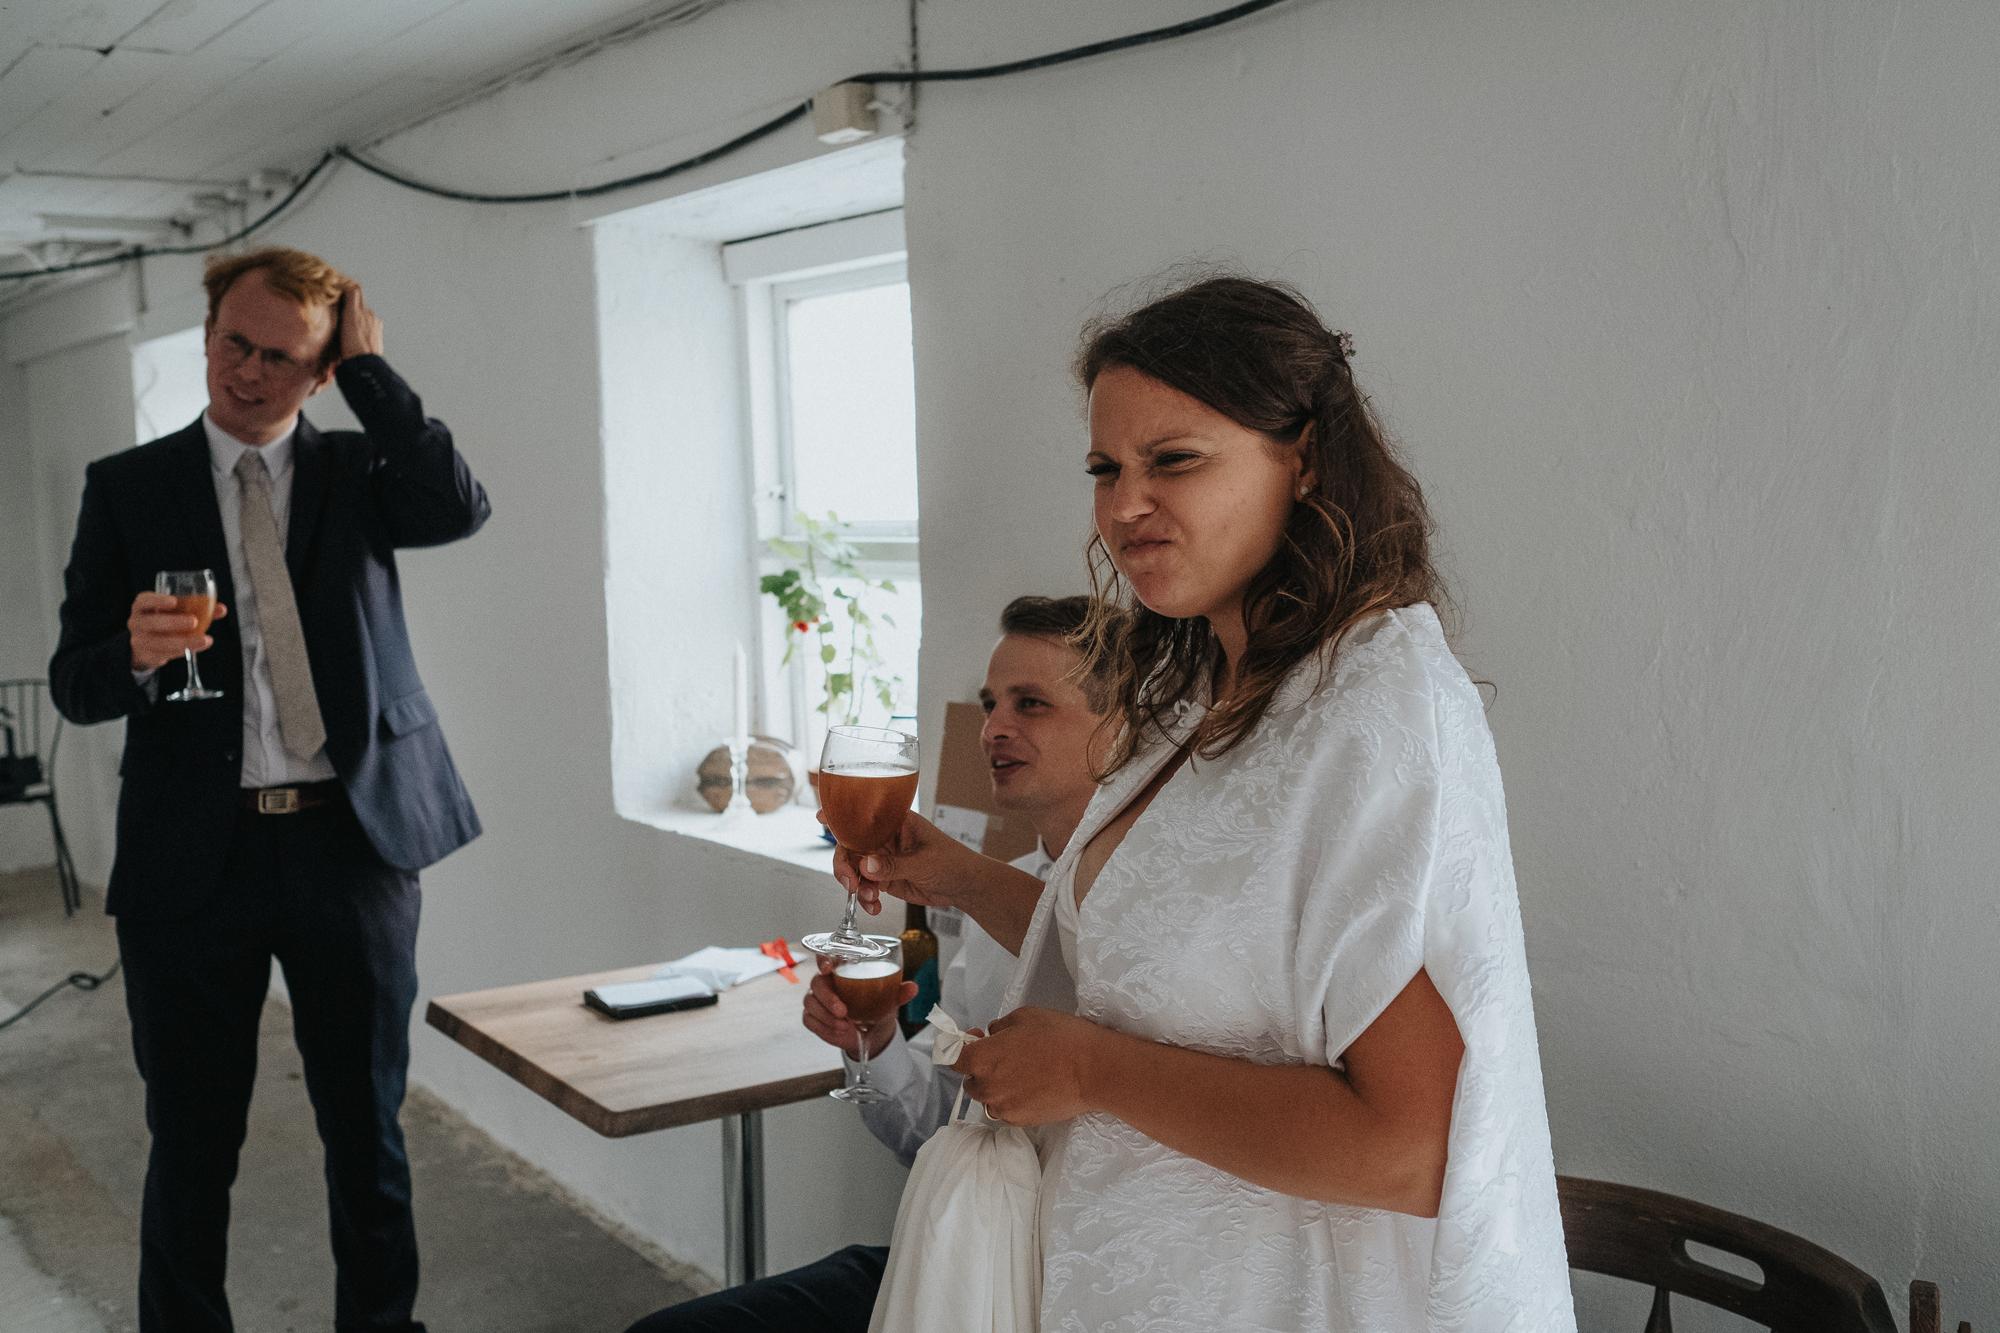 070-bröllop-stora-gåsemora-neas-fotografi.jpg